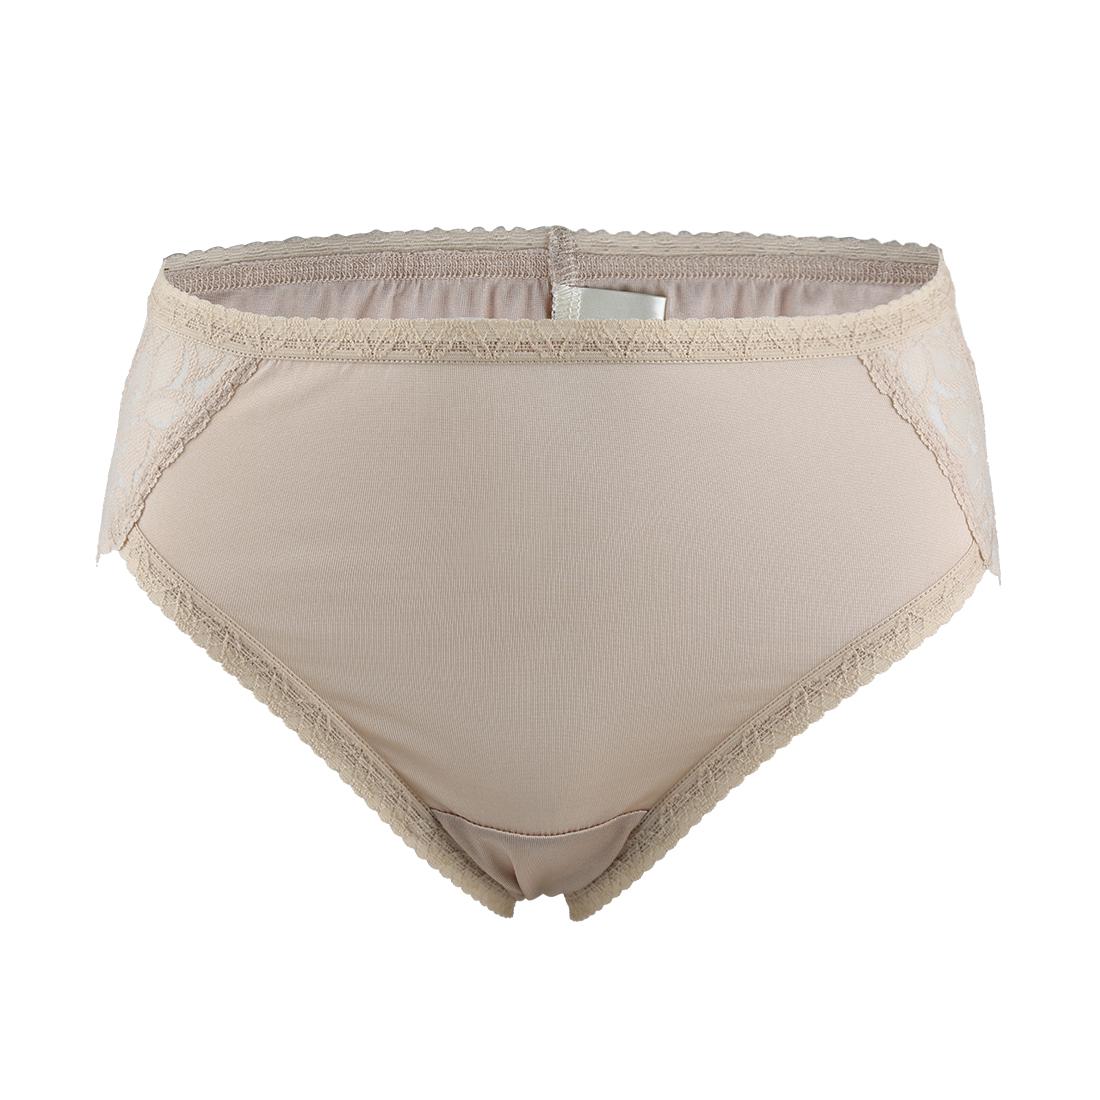 Women Mulberry Silk Laced Breathable Translucent Hi-Cut Panties Beige Meidum